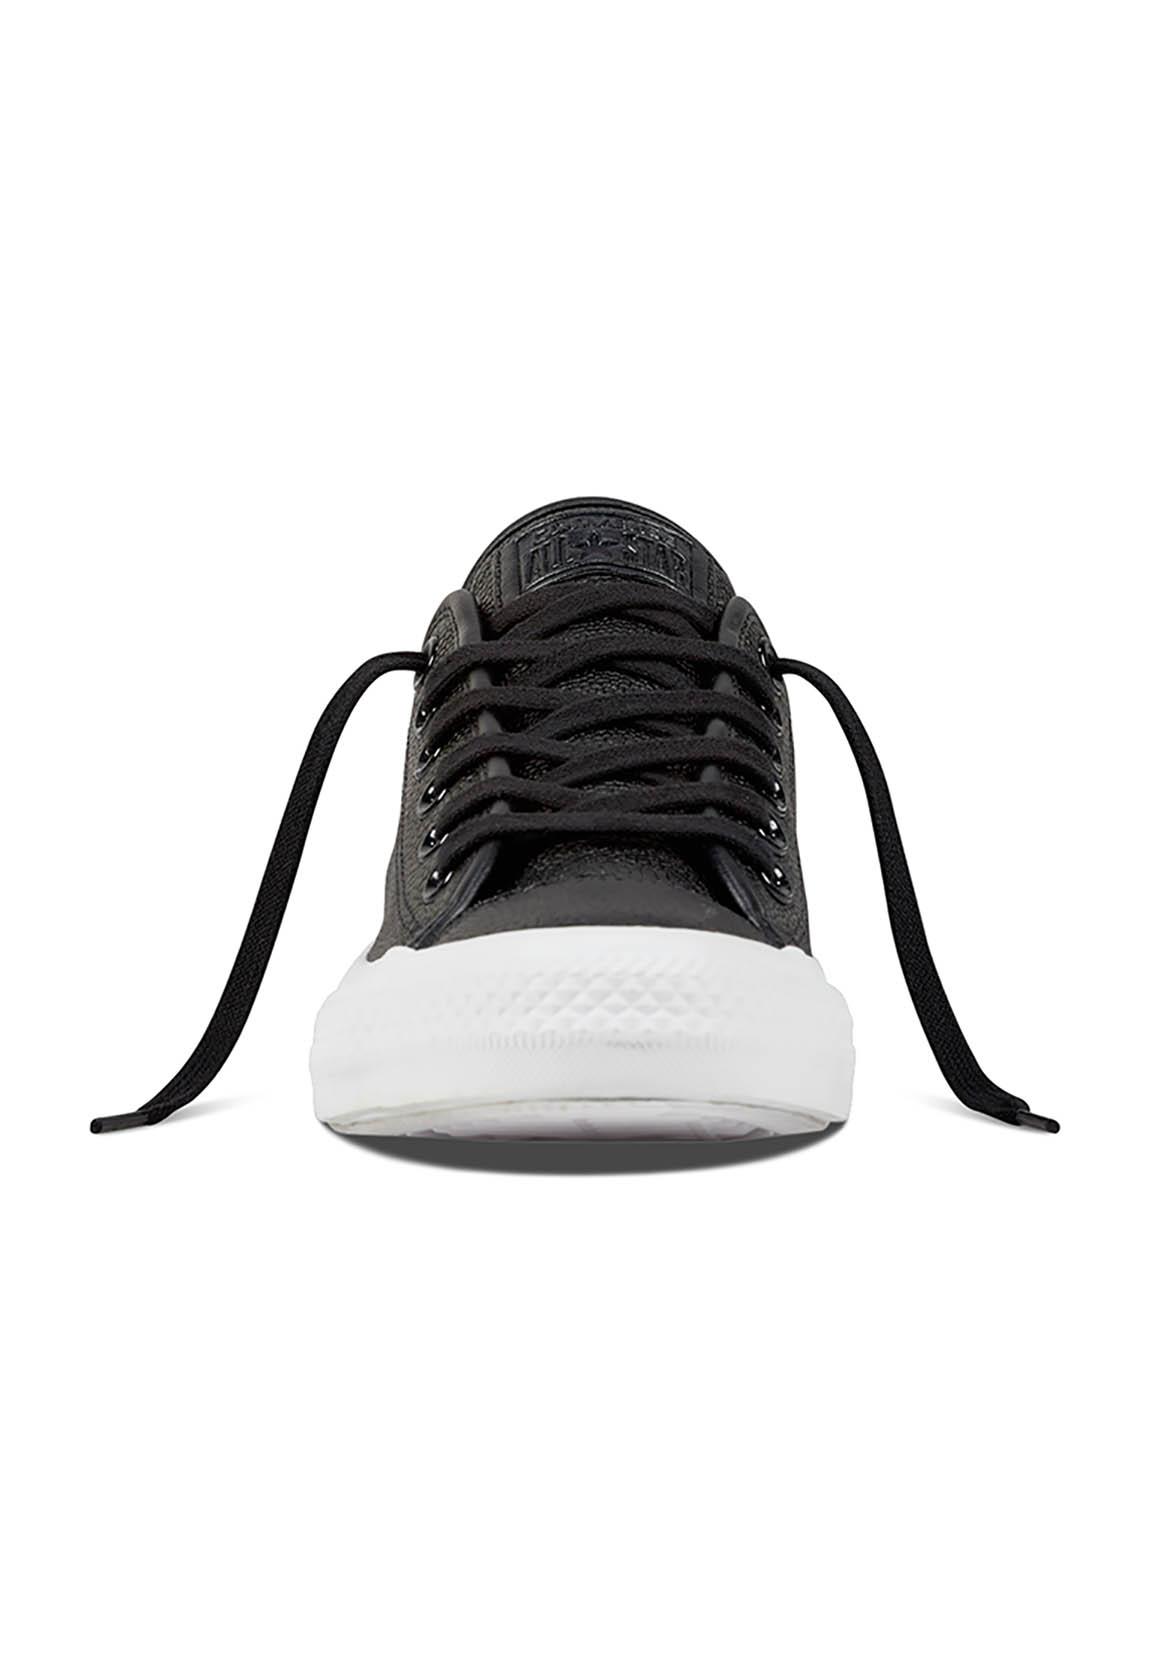 Details about Converse Chucks Low Ct as Ox 157667c Black